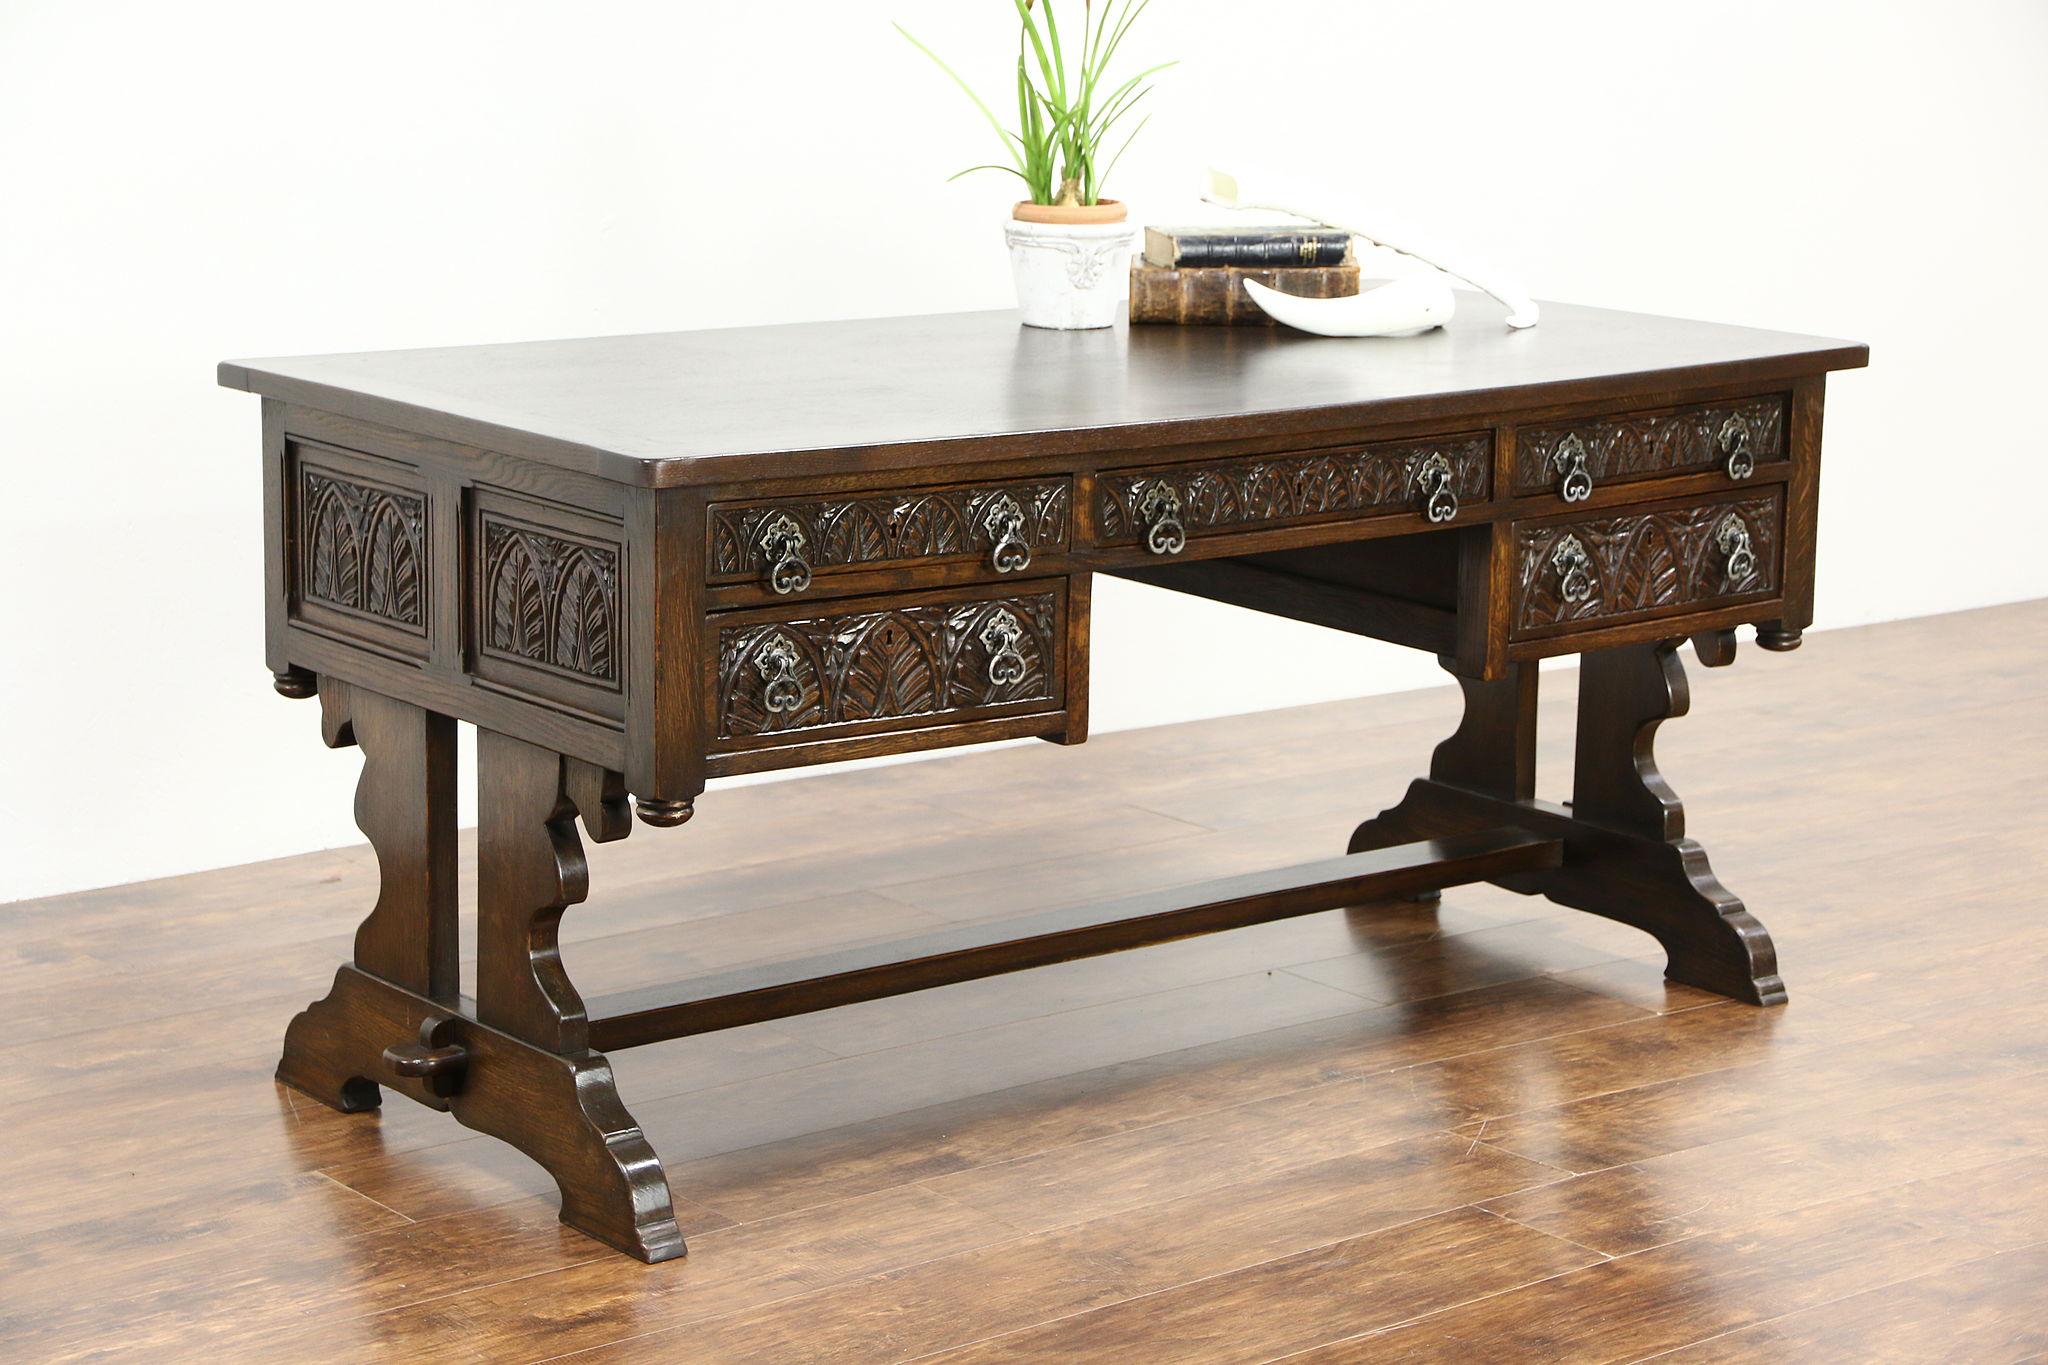 Brand-new SOLD - Oak 1910 Antique Renaissance Carved Library Writing Desk  TU48